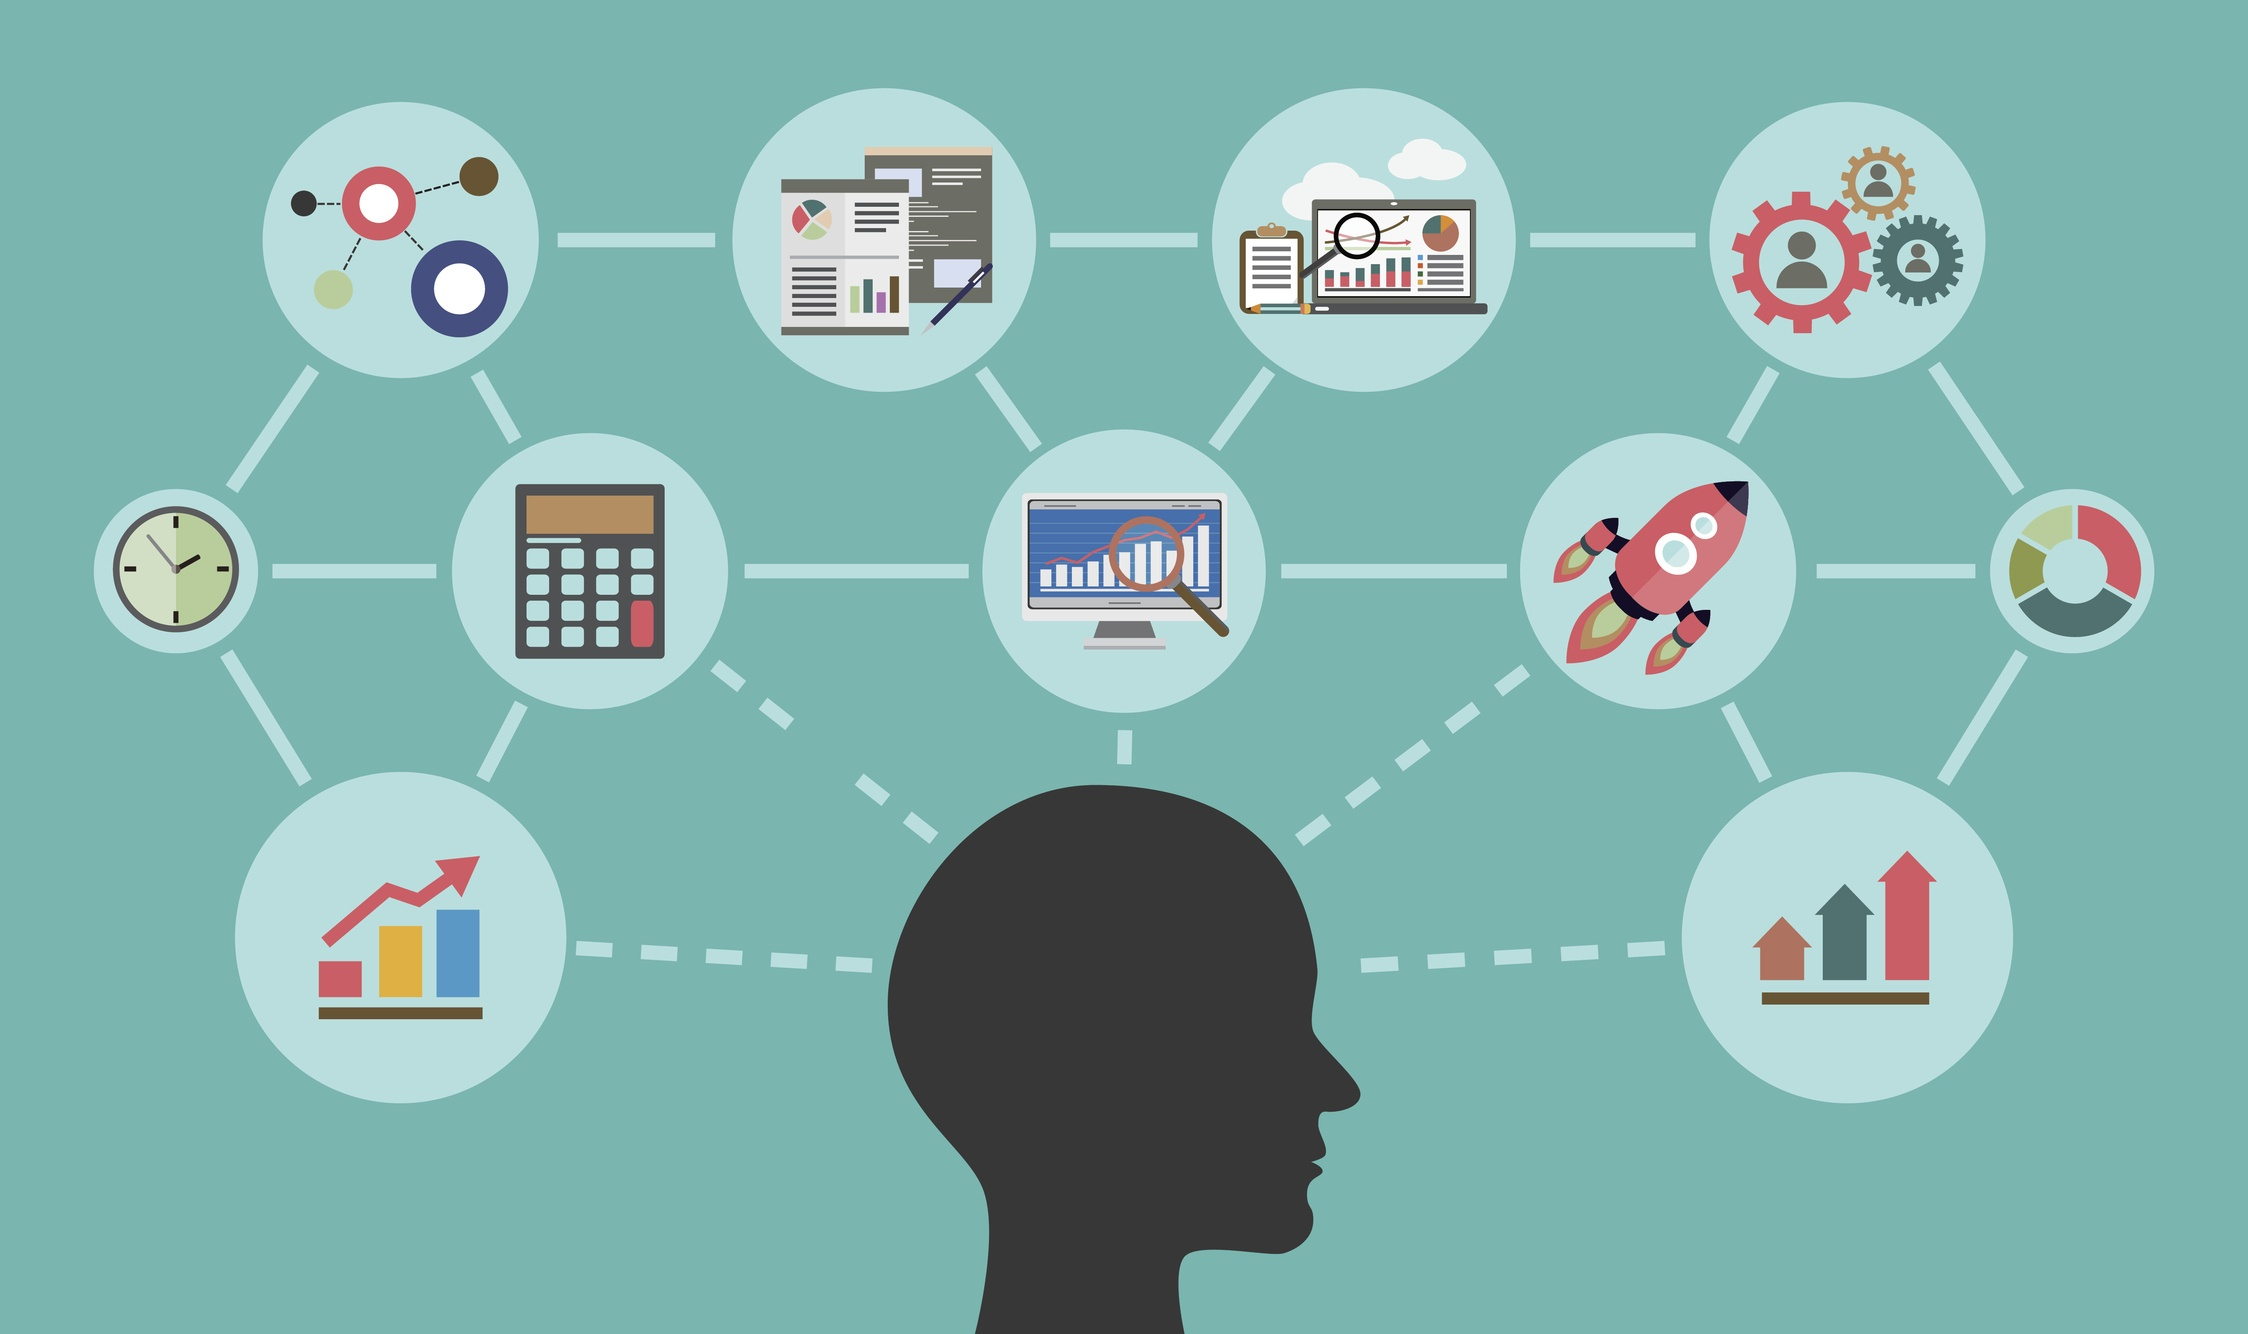 Essential marketing skills needed for a marketing company